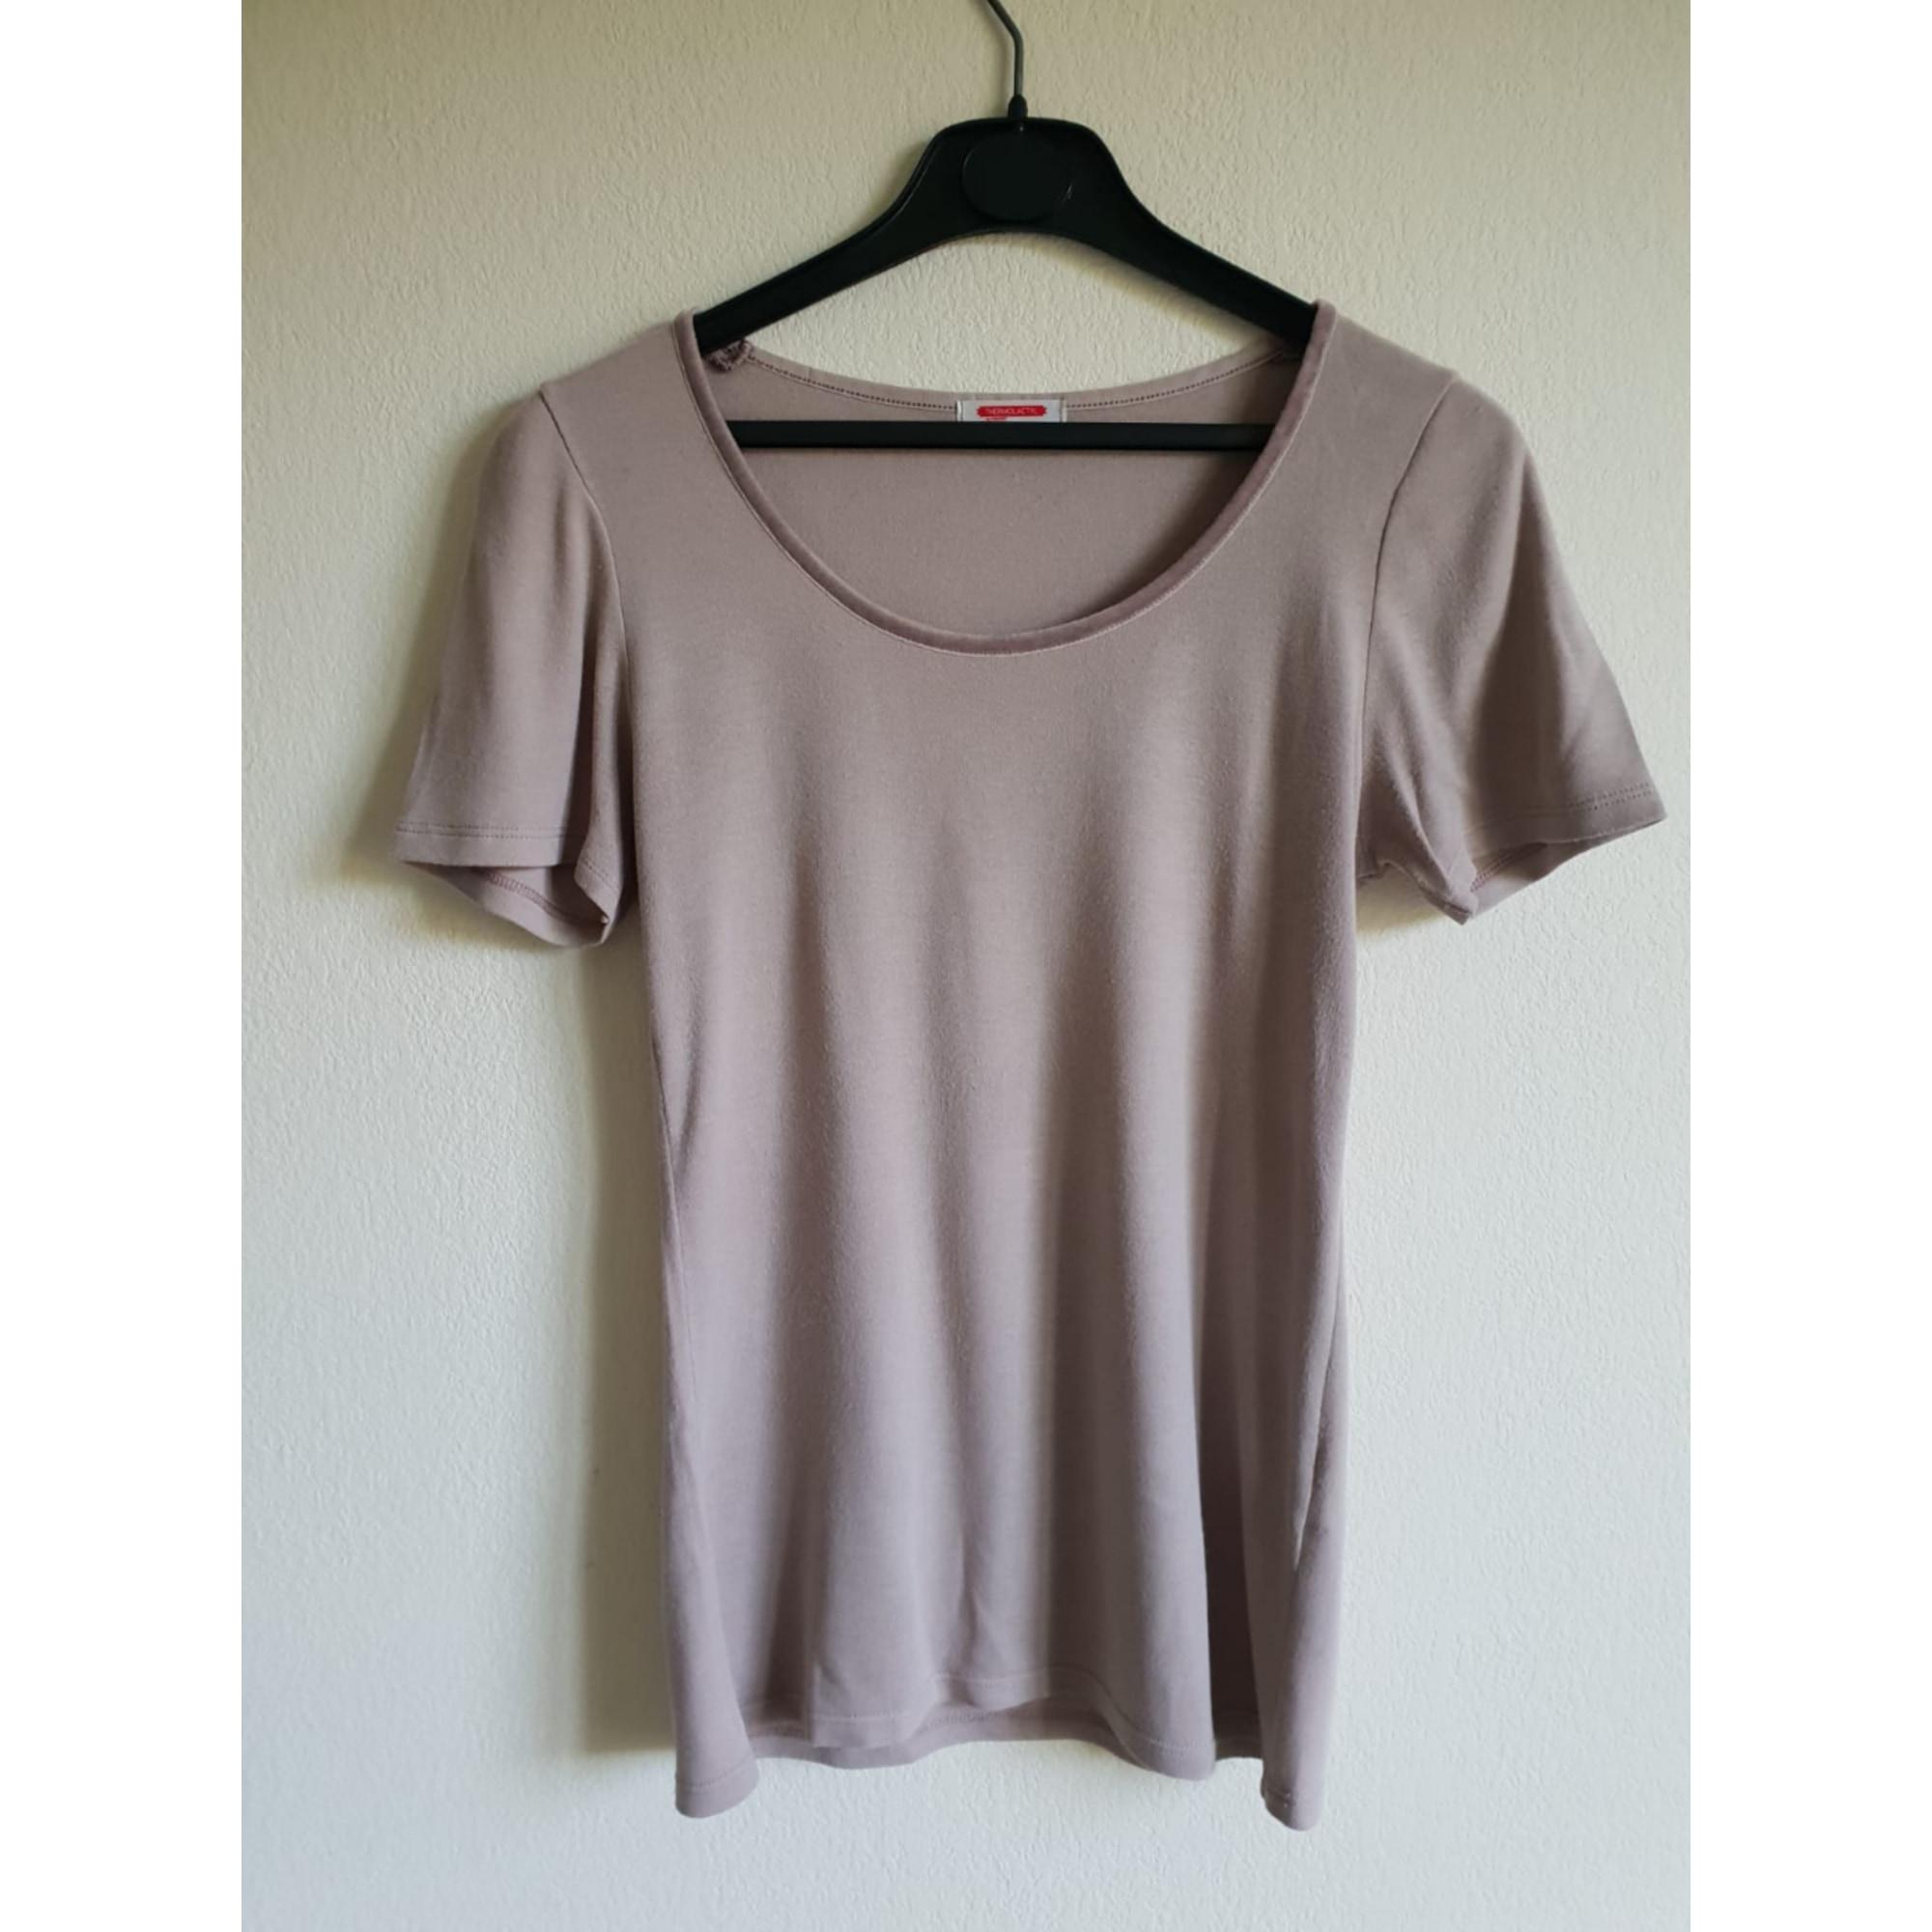 Top, tee-shirt DAMART Violet, mauve, lavande